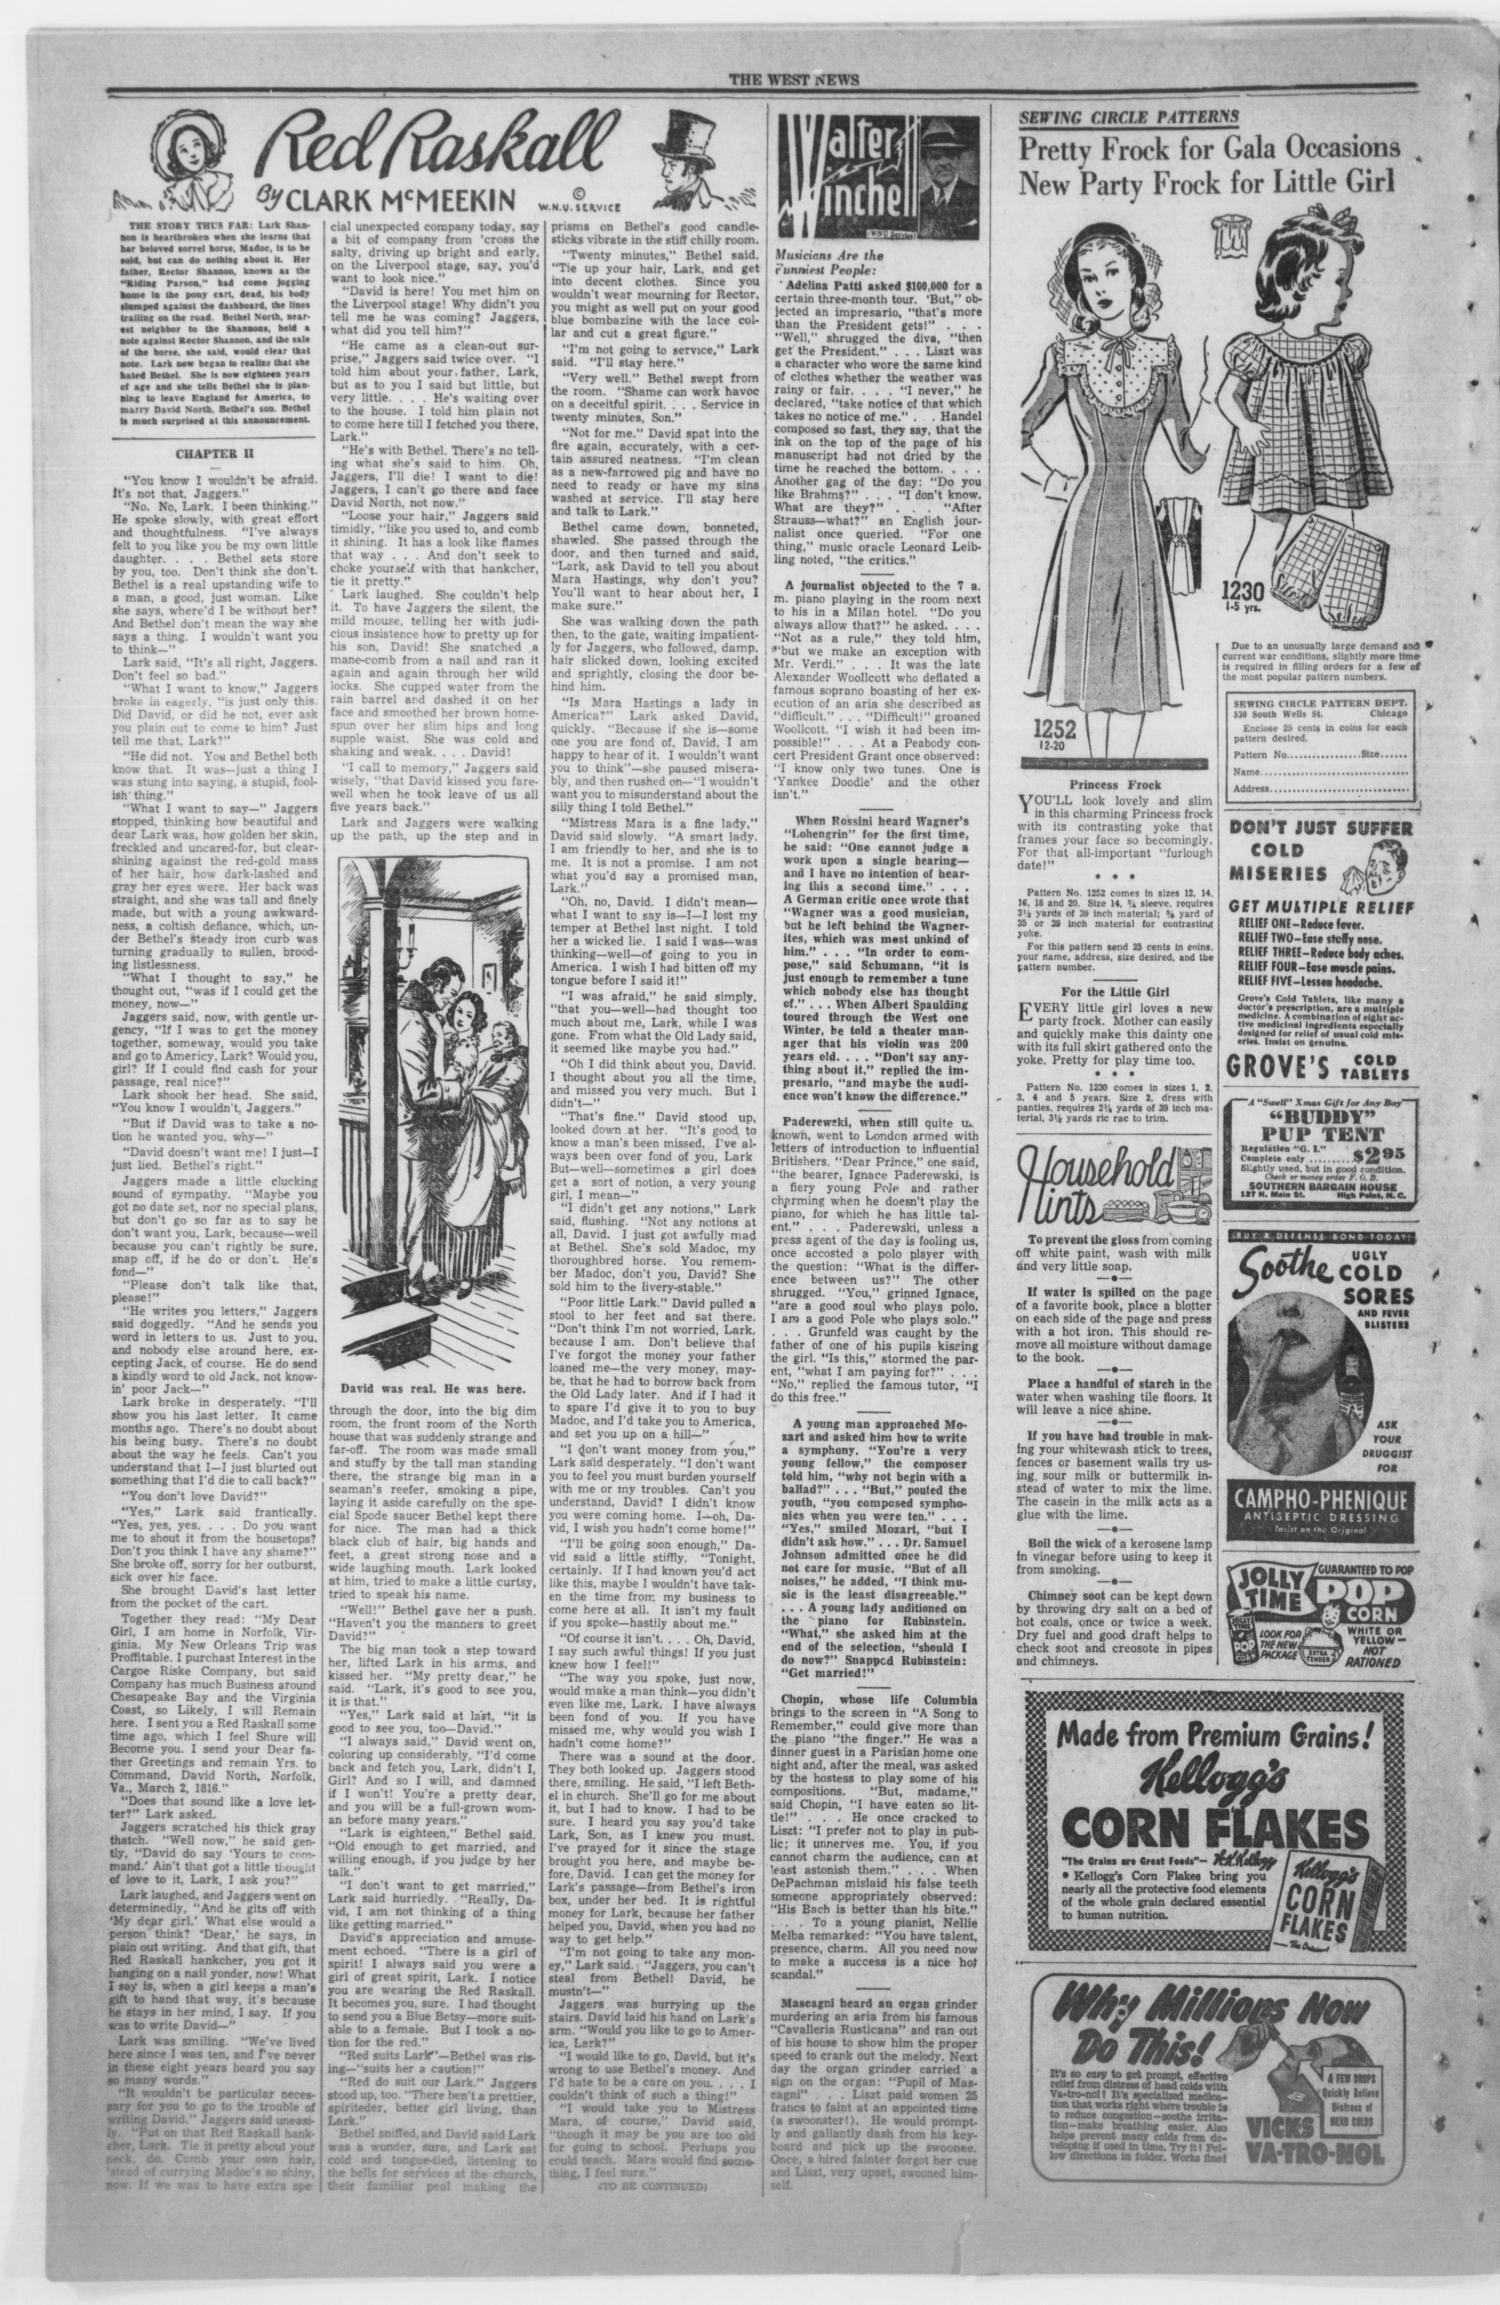 The West News (West, Tex ), Vol  55, No  29, Ed  1 Friday